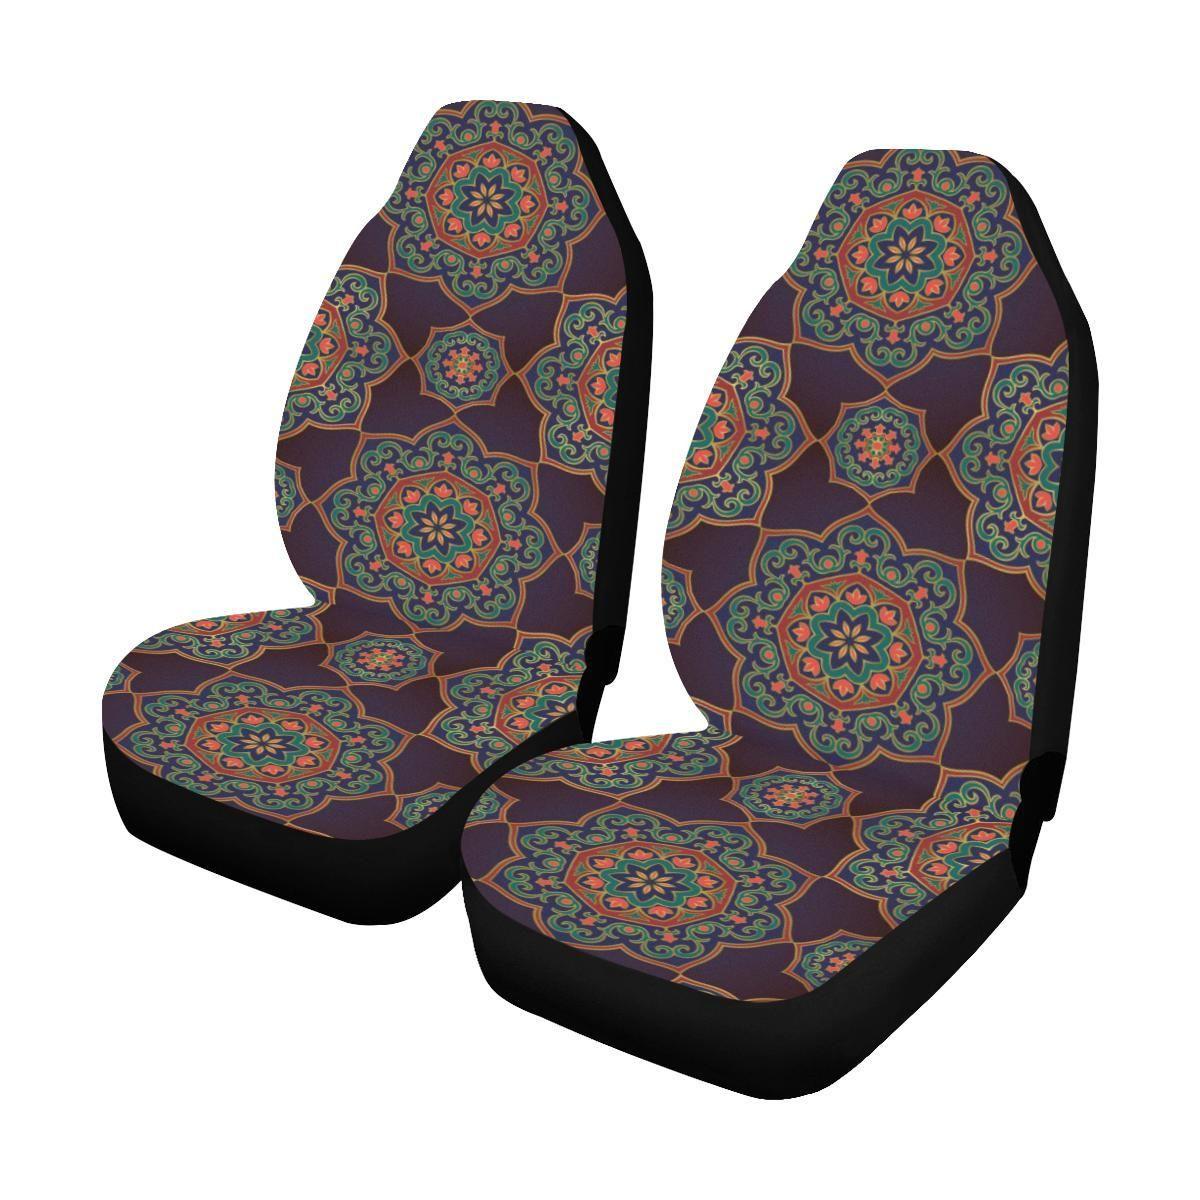 Medallion Pattern Print Design 03 Universal Fit Car Seat Covers Carseat Cover Car Seats Car Seat Cover Sets